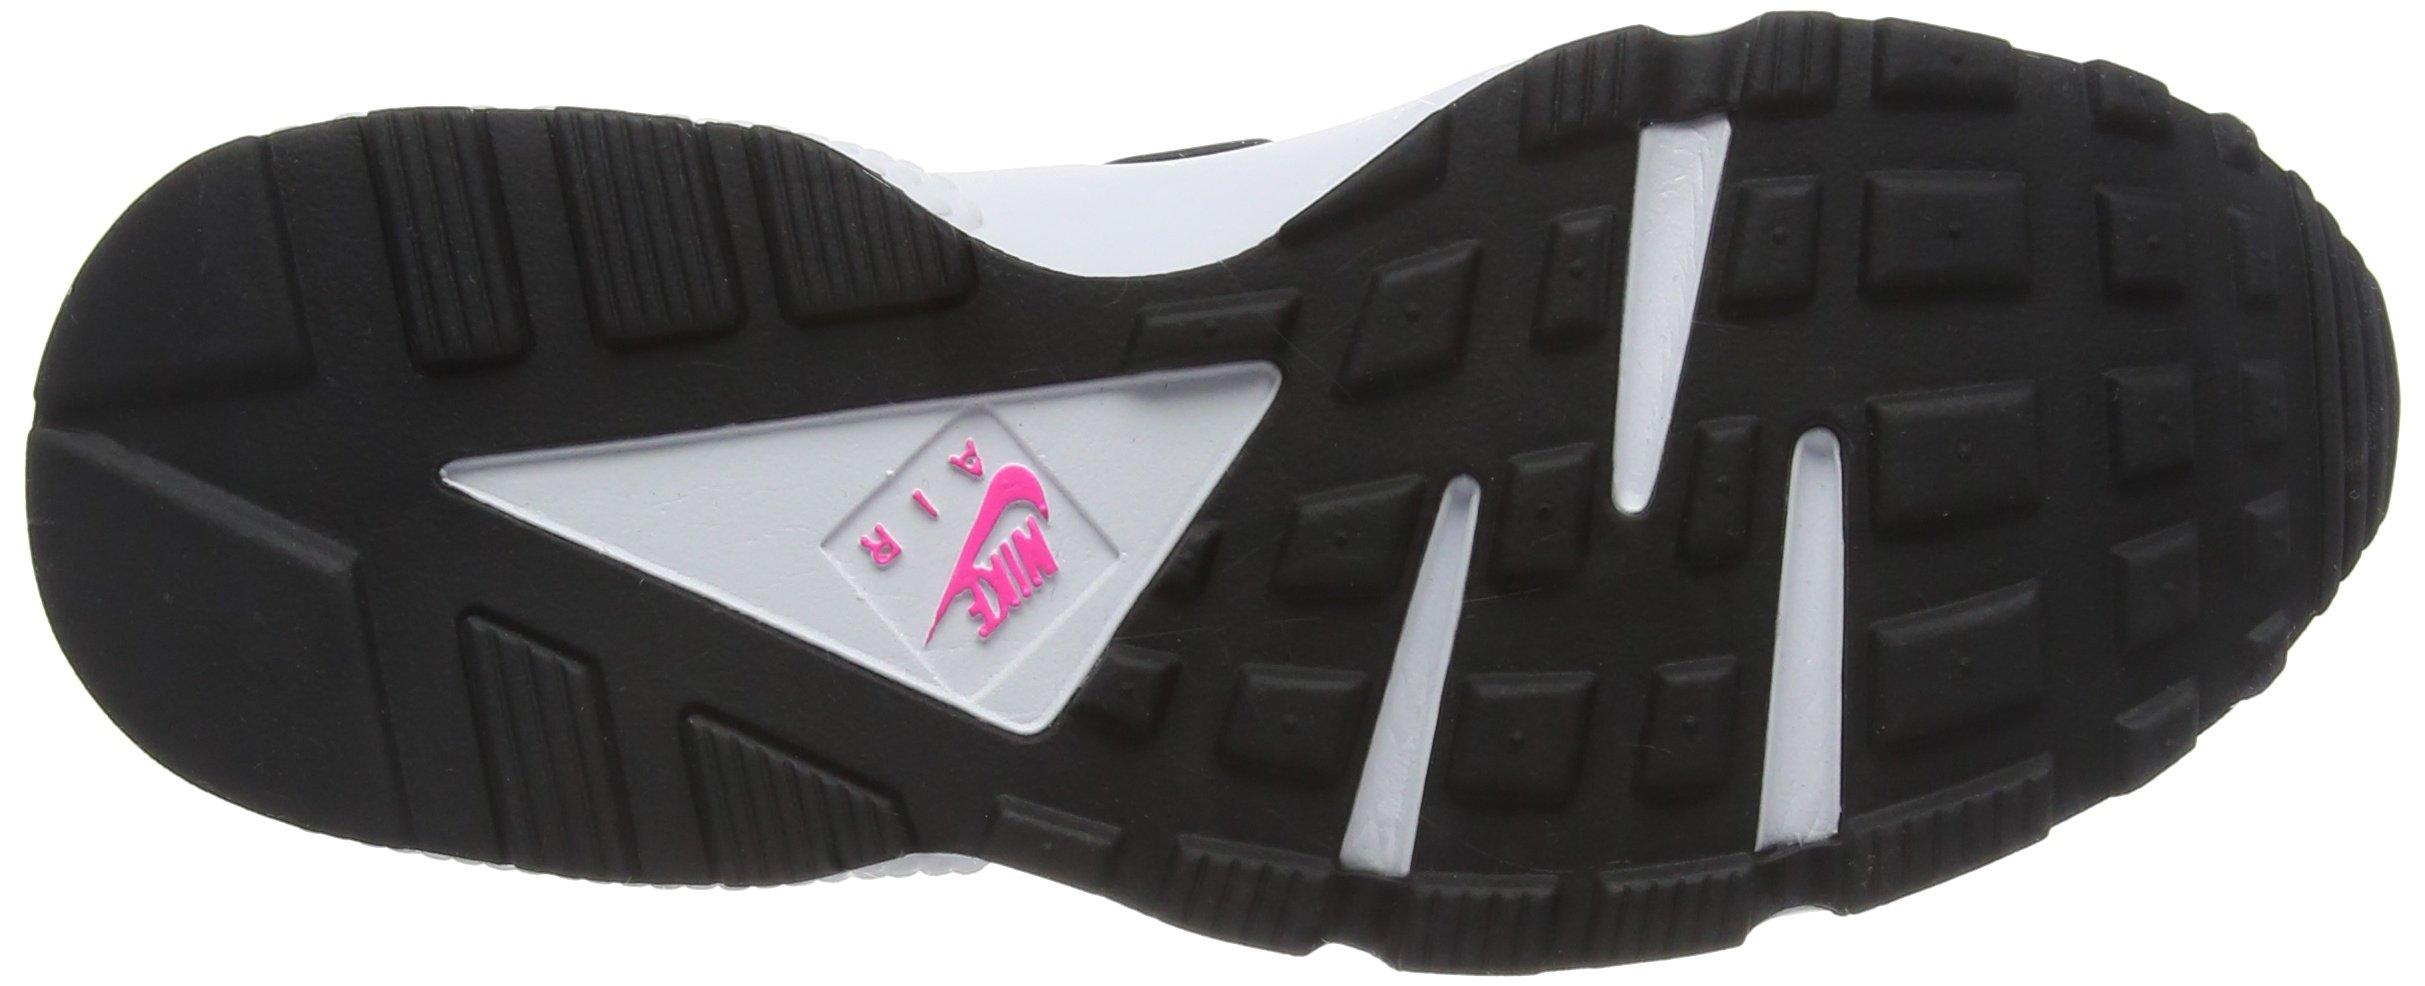 71ZOtUfKBqL - Nike Women's Wmns Air Huarache Running Shoes